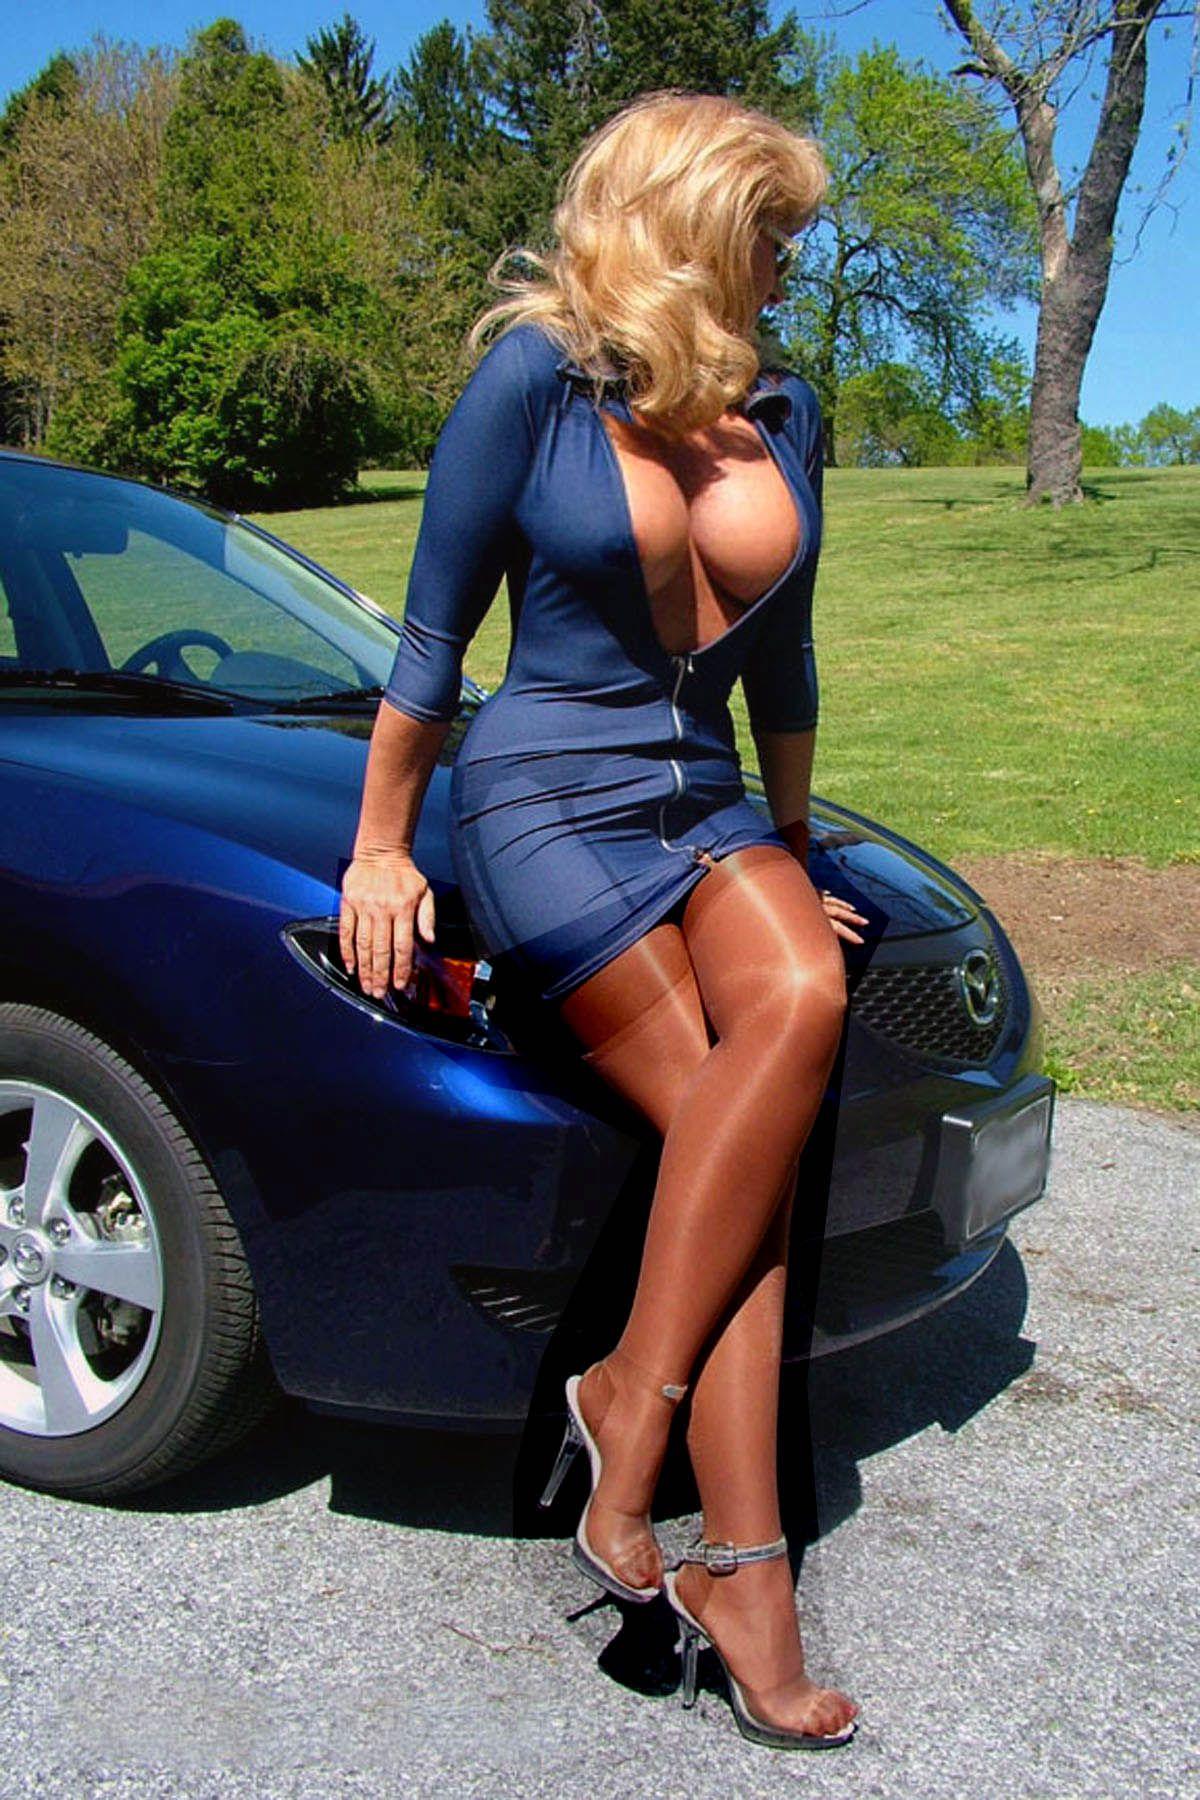 buckwild hot girls in bikini